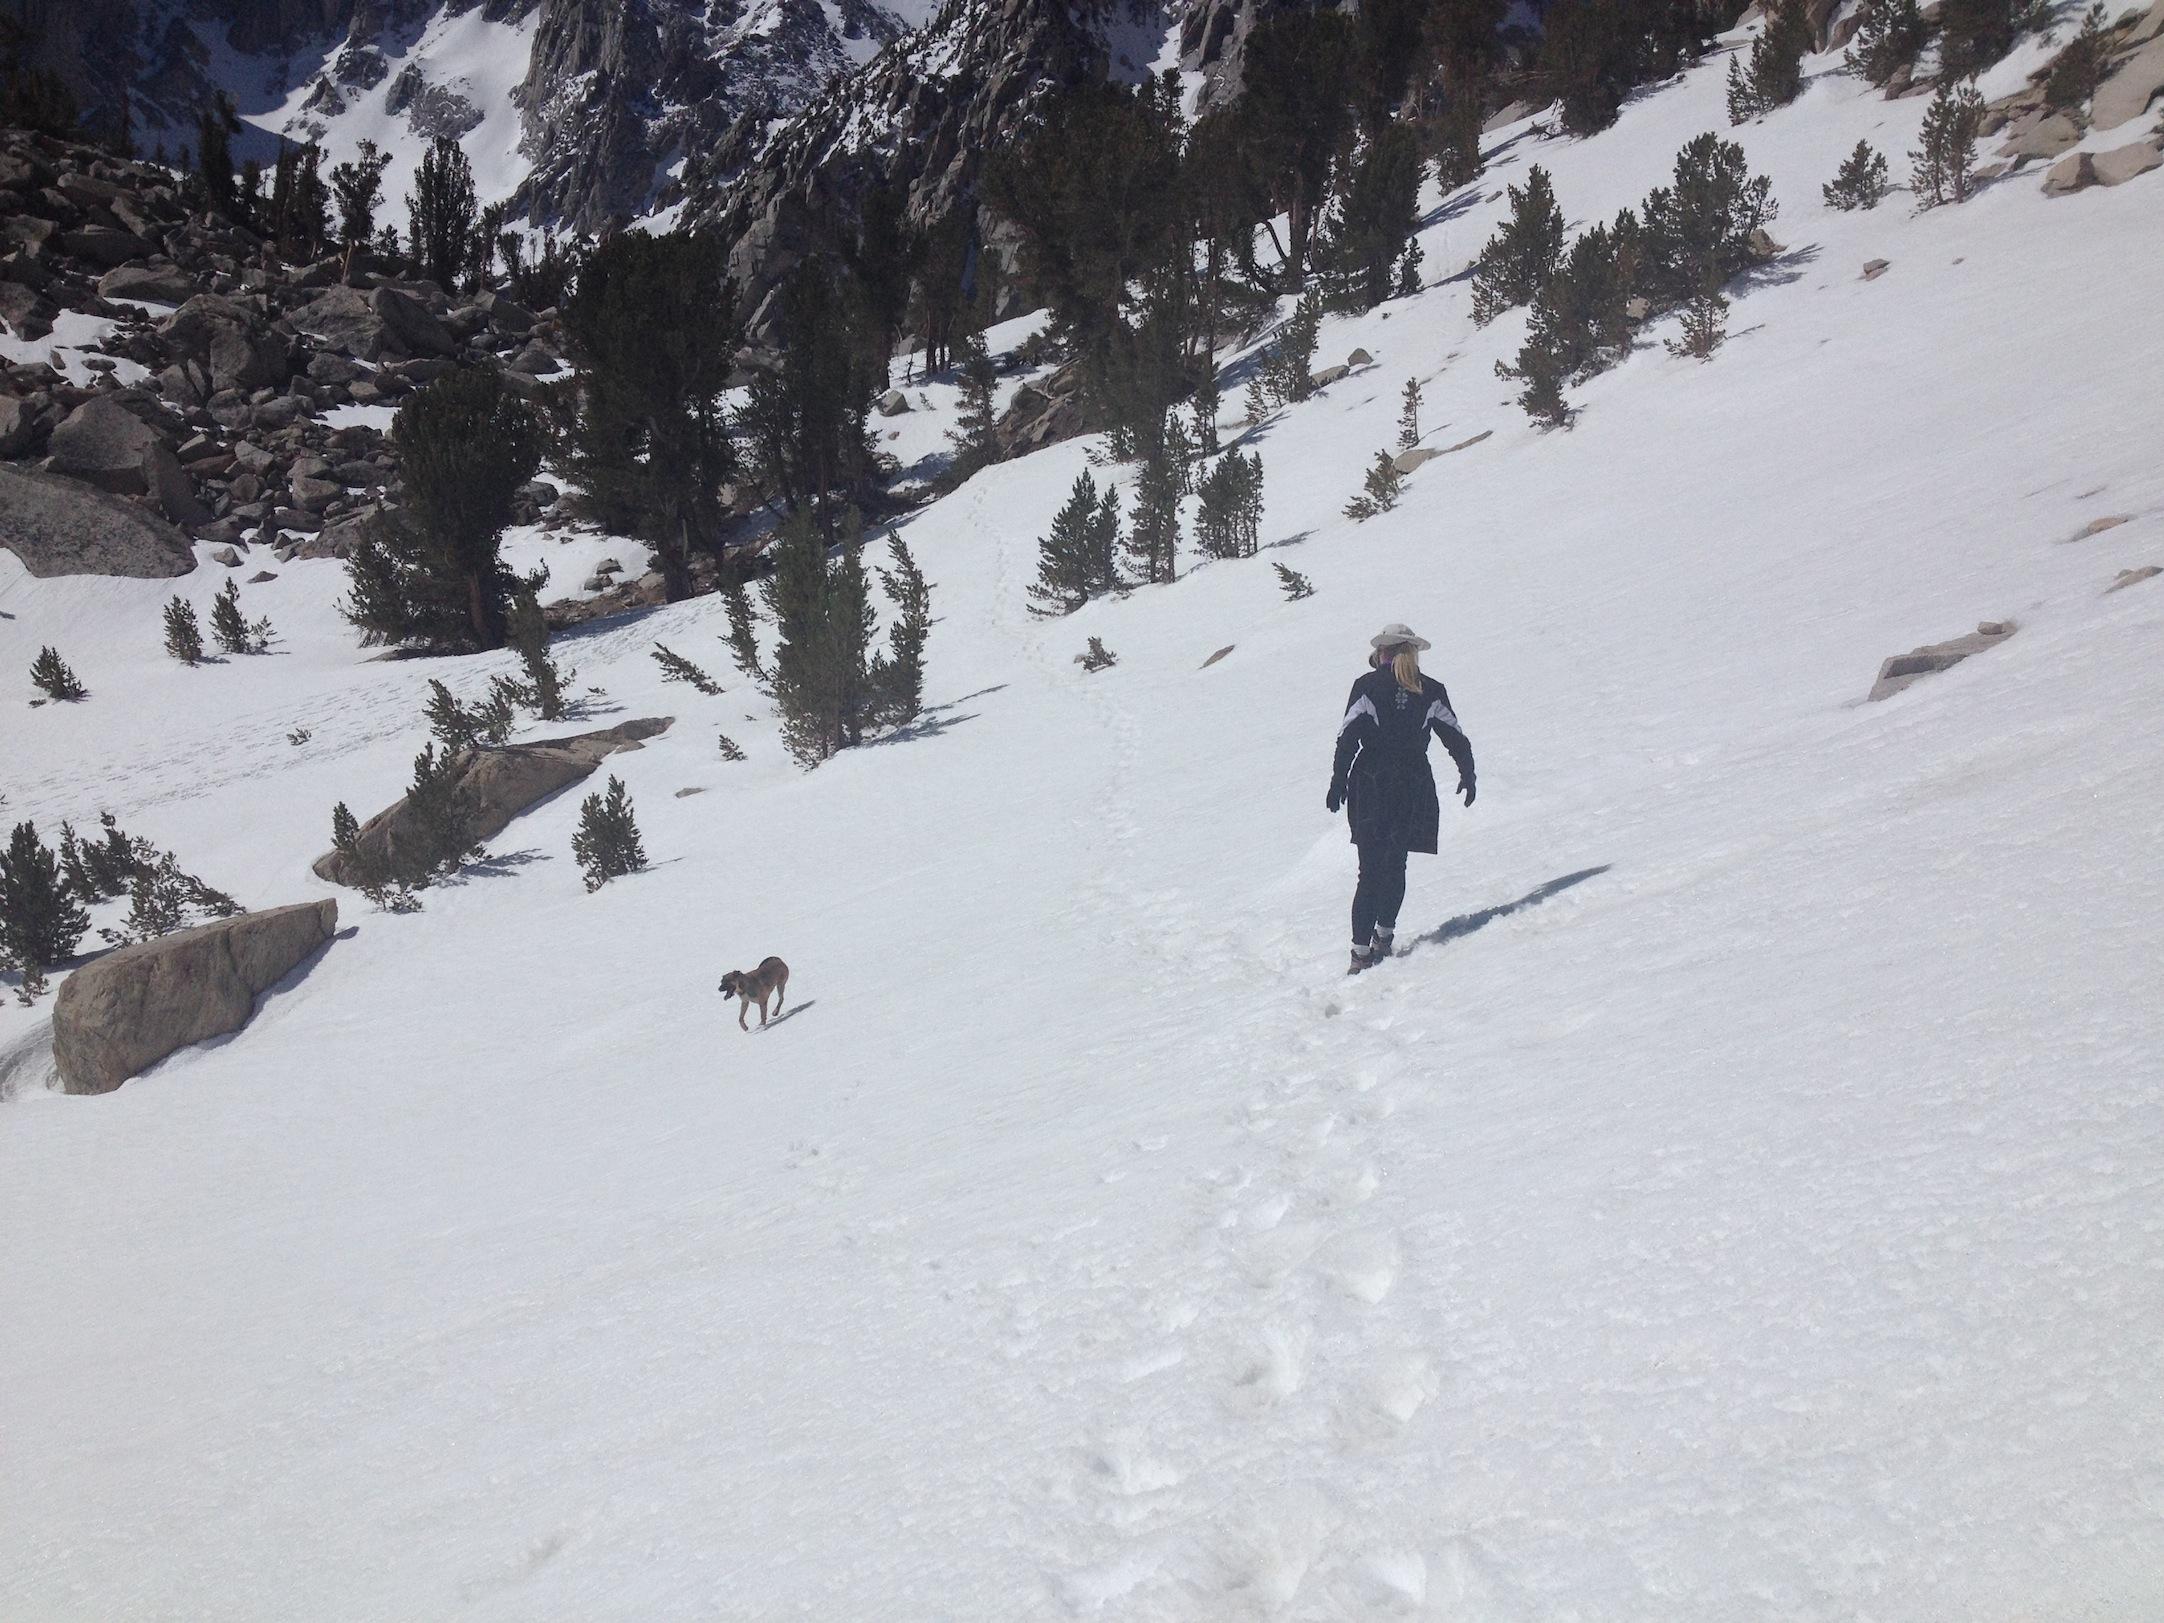 Snow near Heart Lake on way to Kearsarge Pass, May 13, 2014